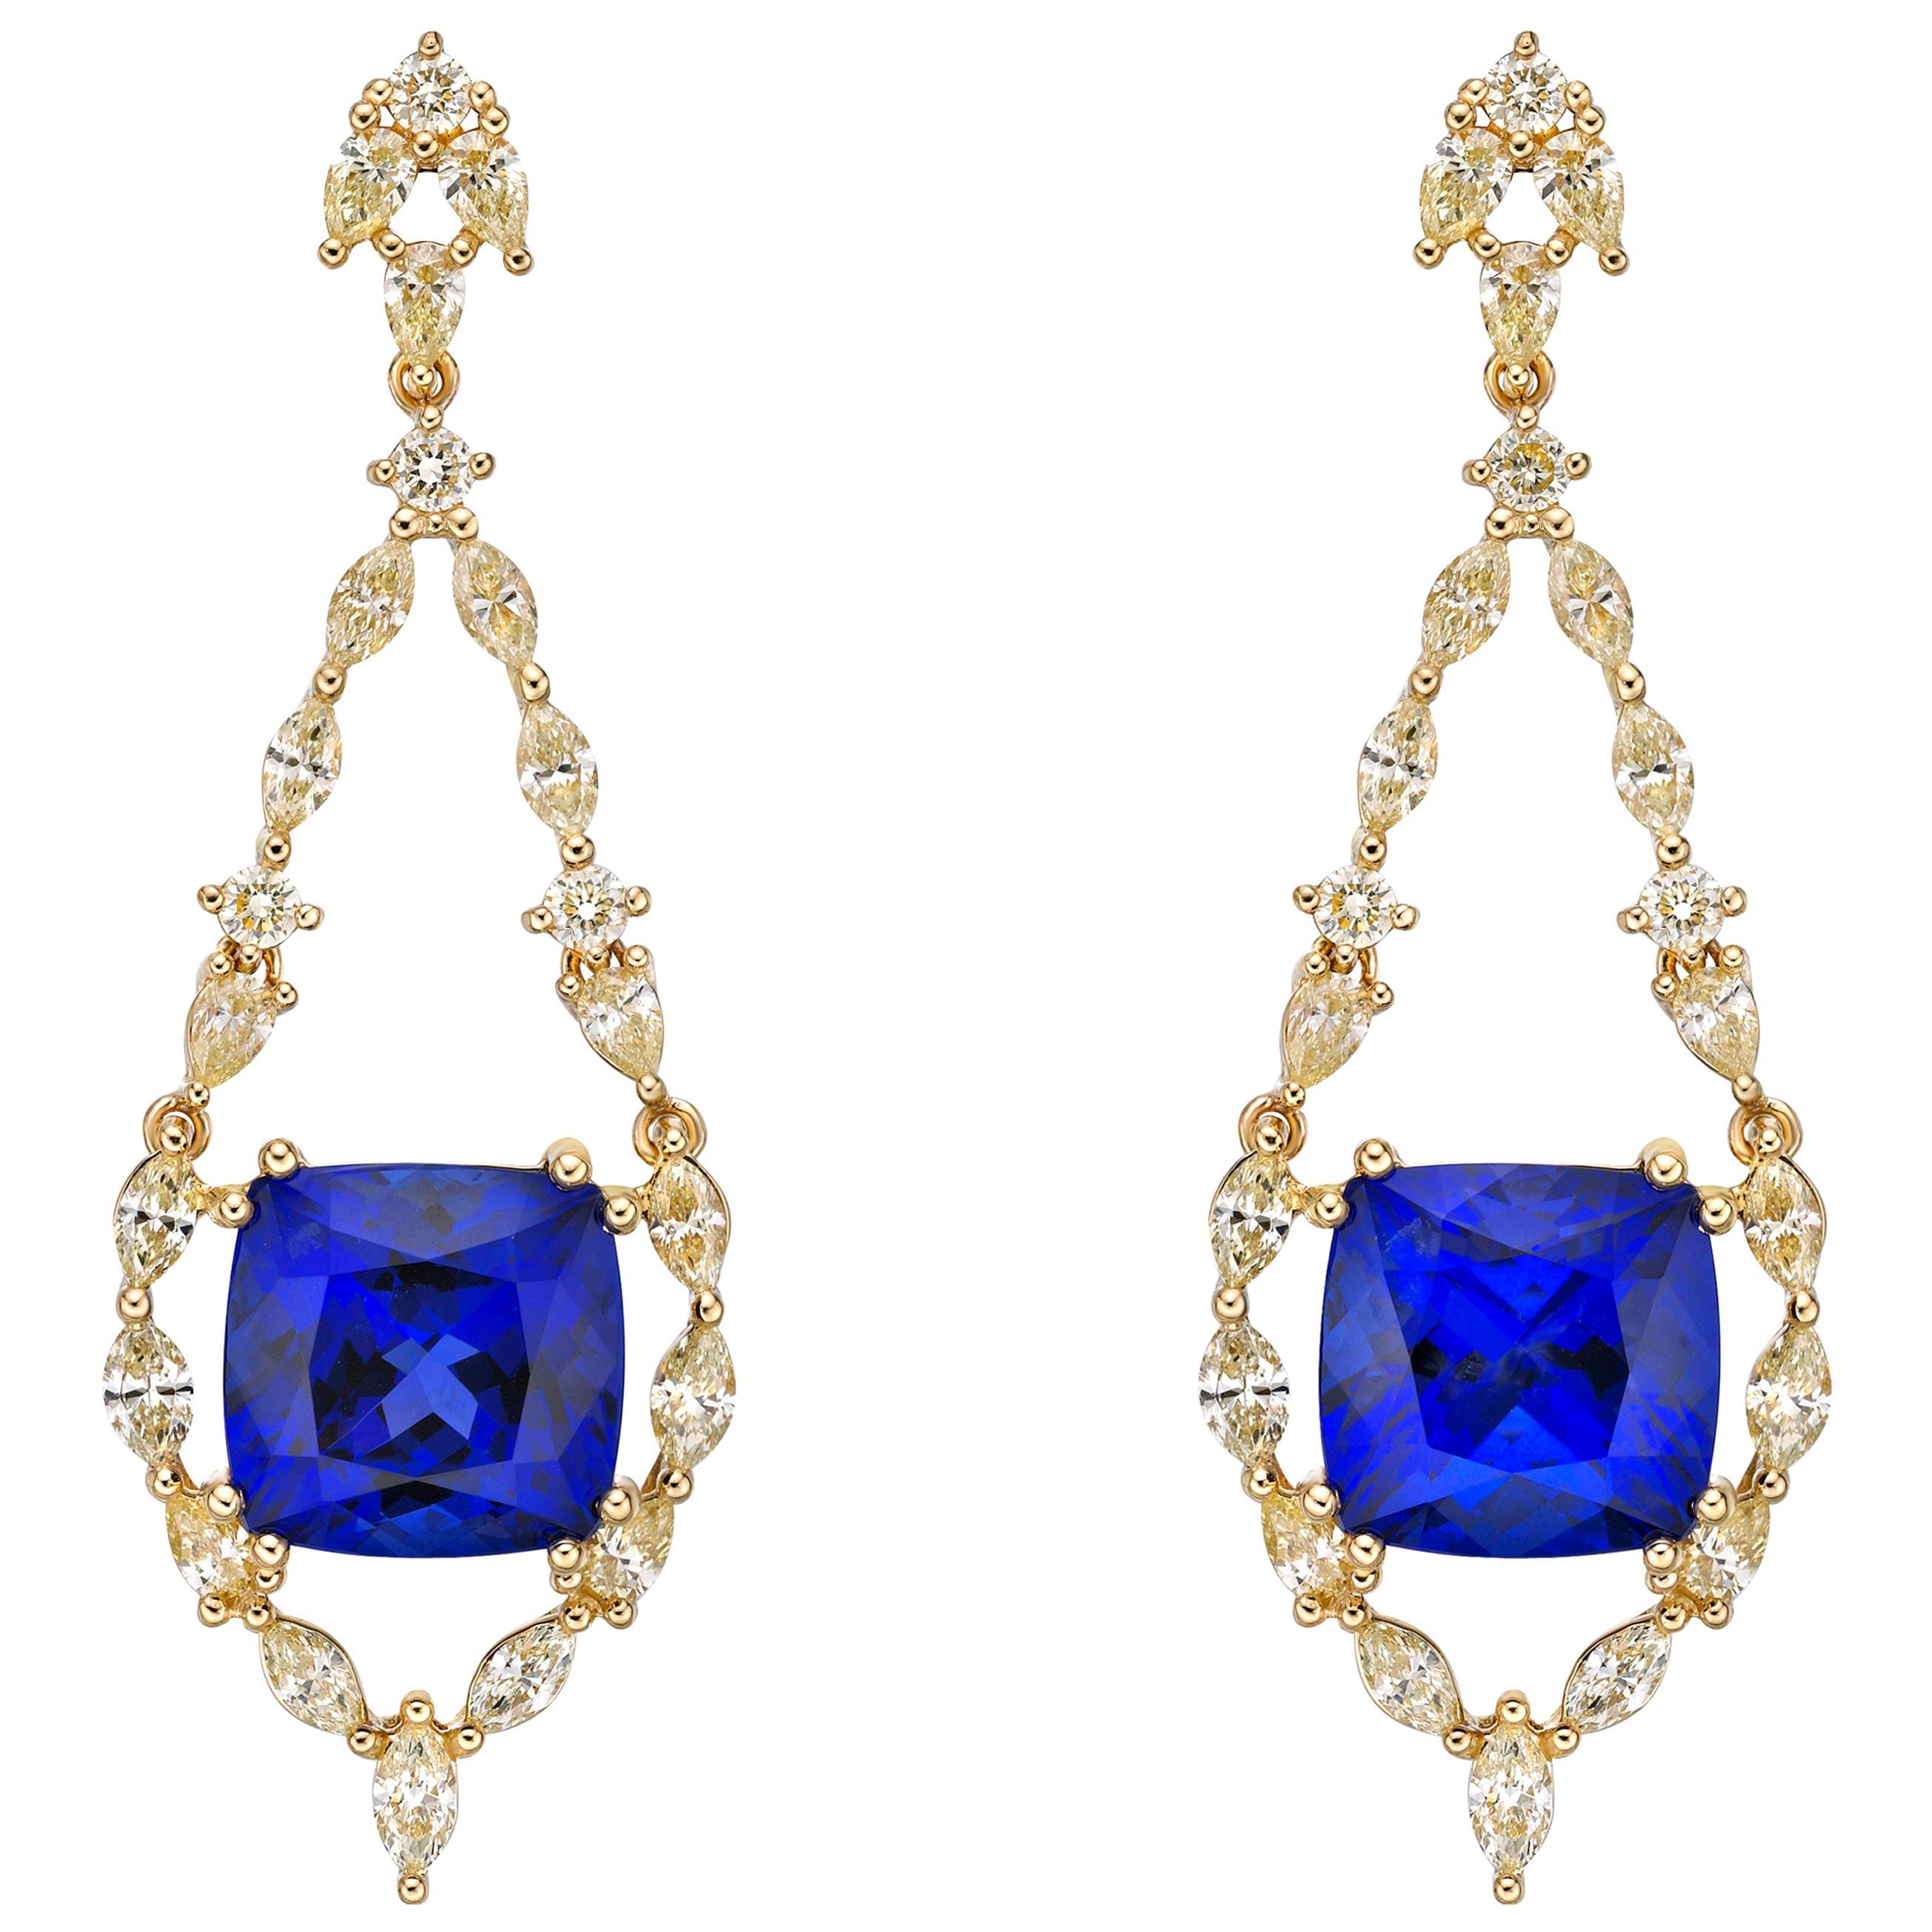 16.2 Carat Tanzanite and Yellow Diamond Earring in 18 Karat Yellow Gold